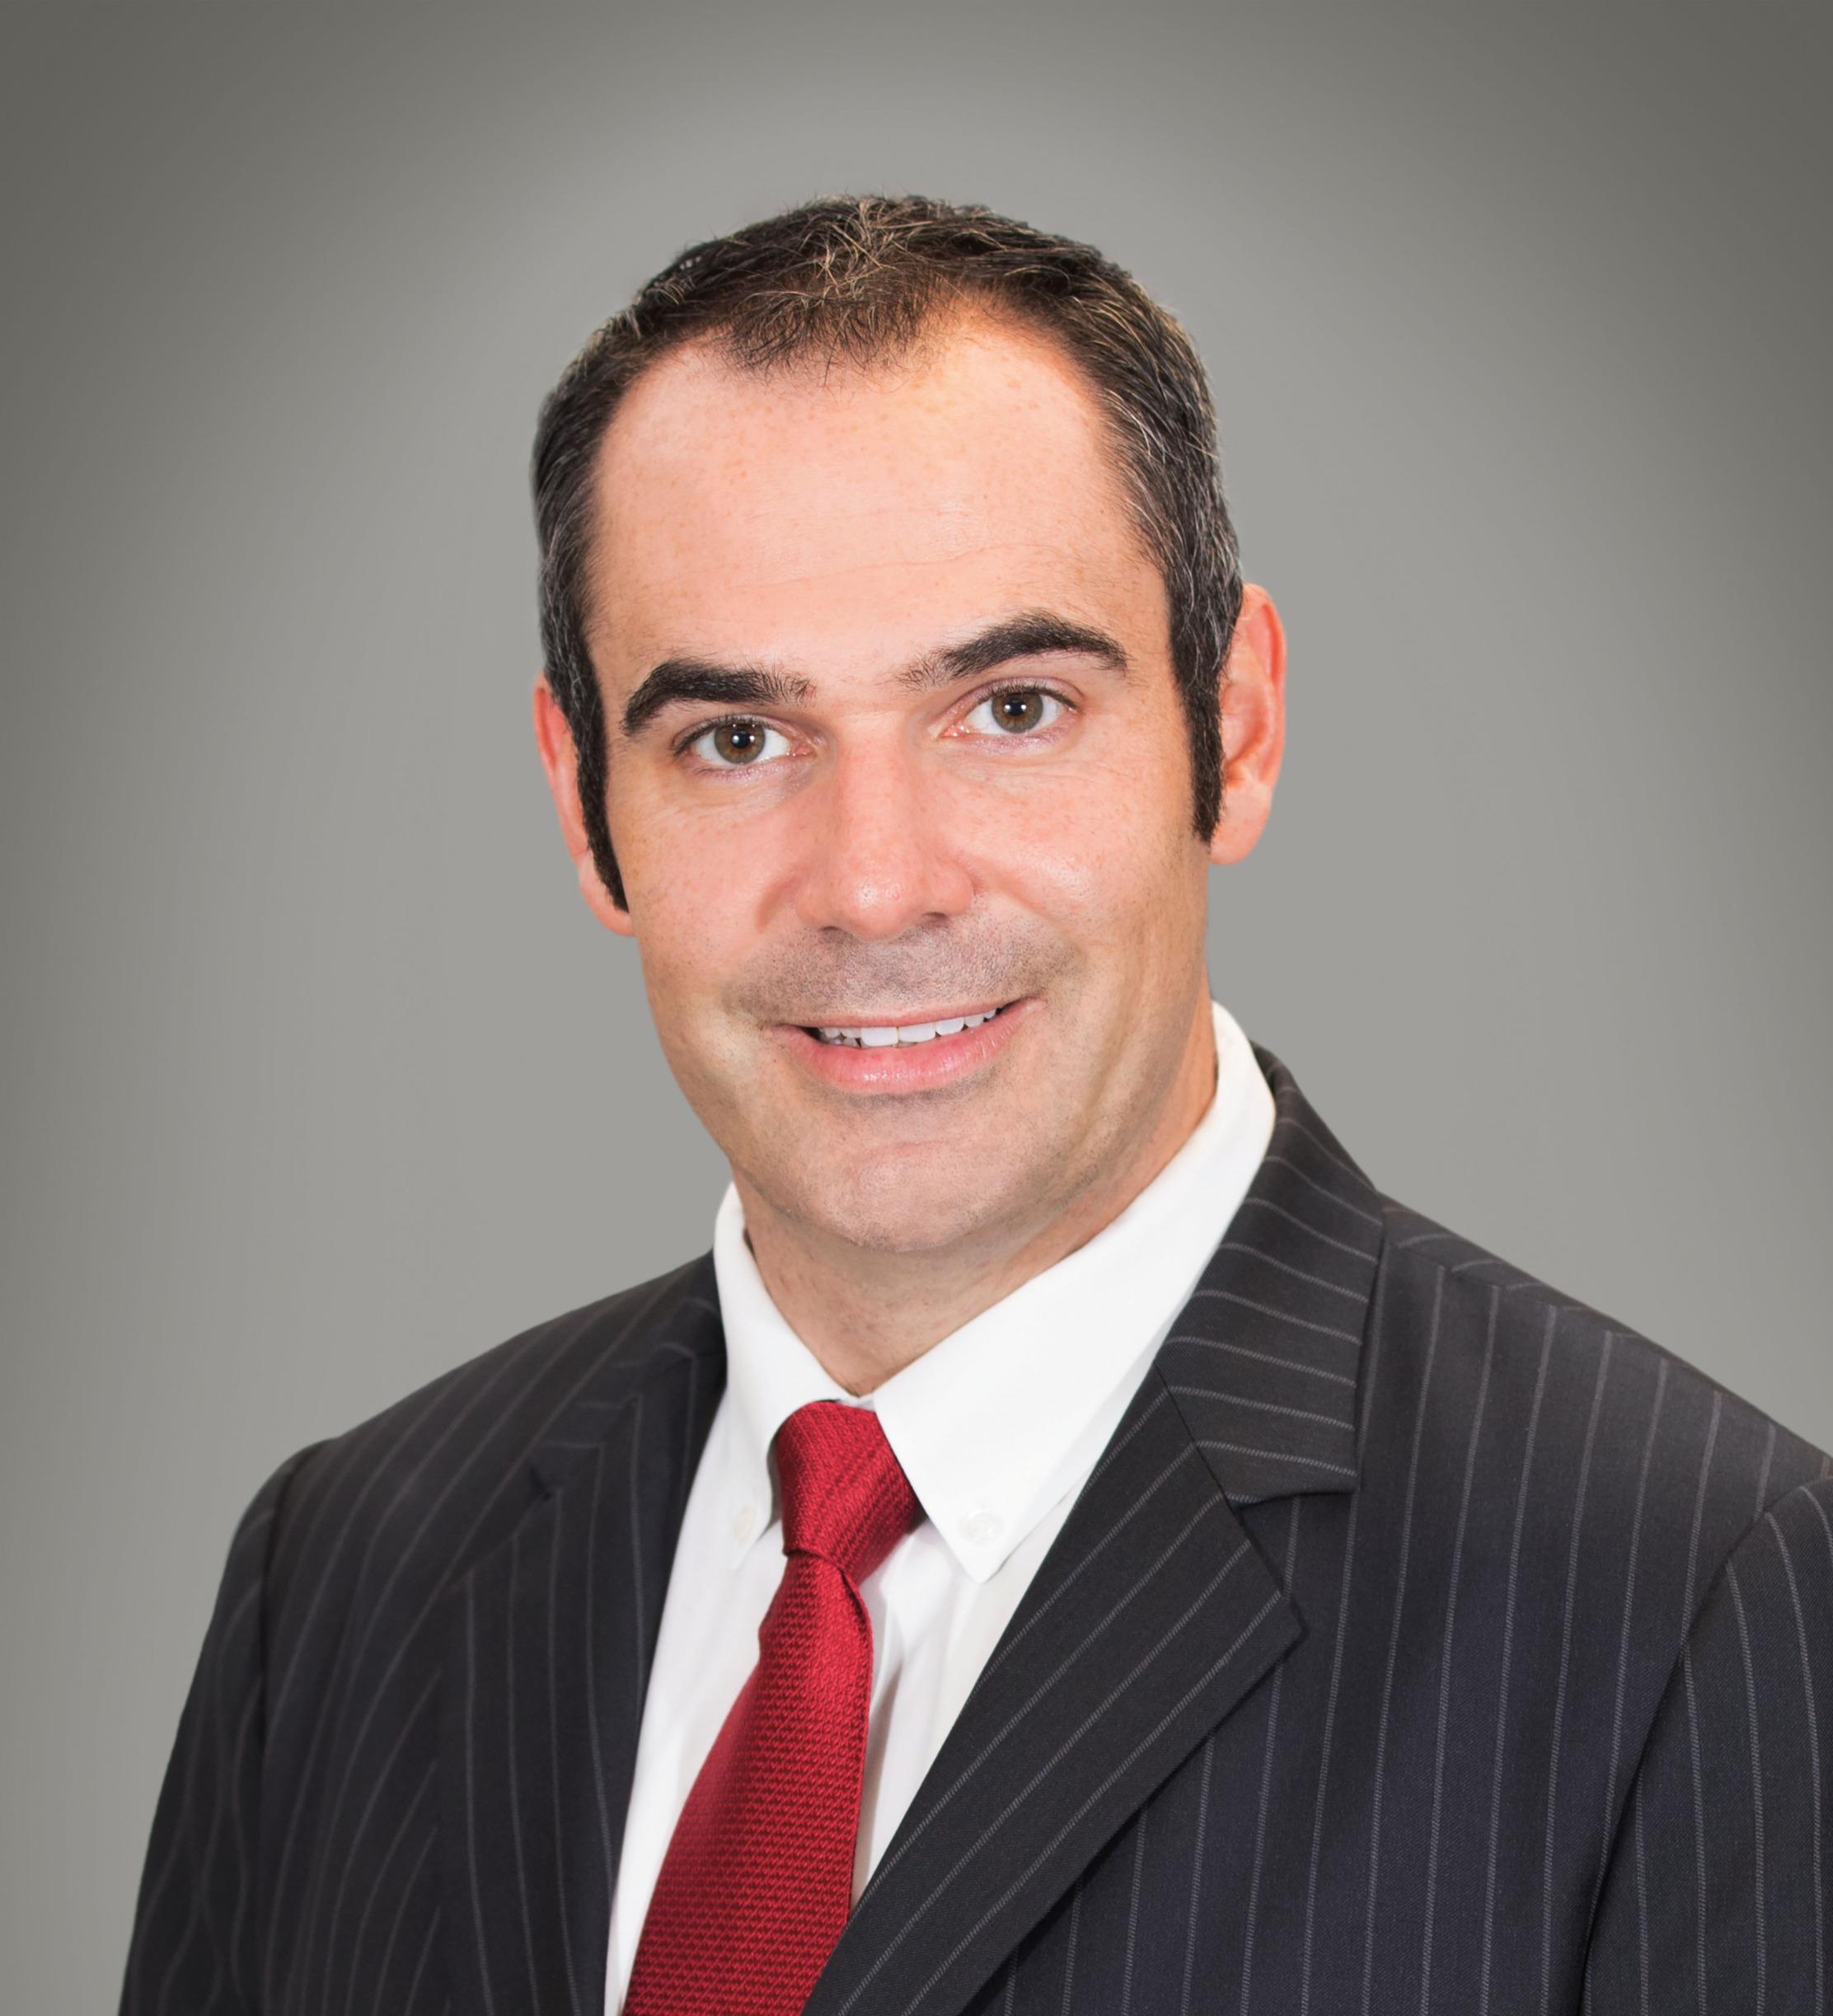 Joshua Terebelo's Profile Image